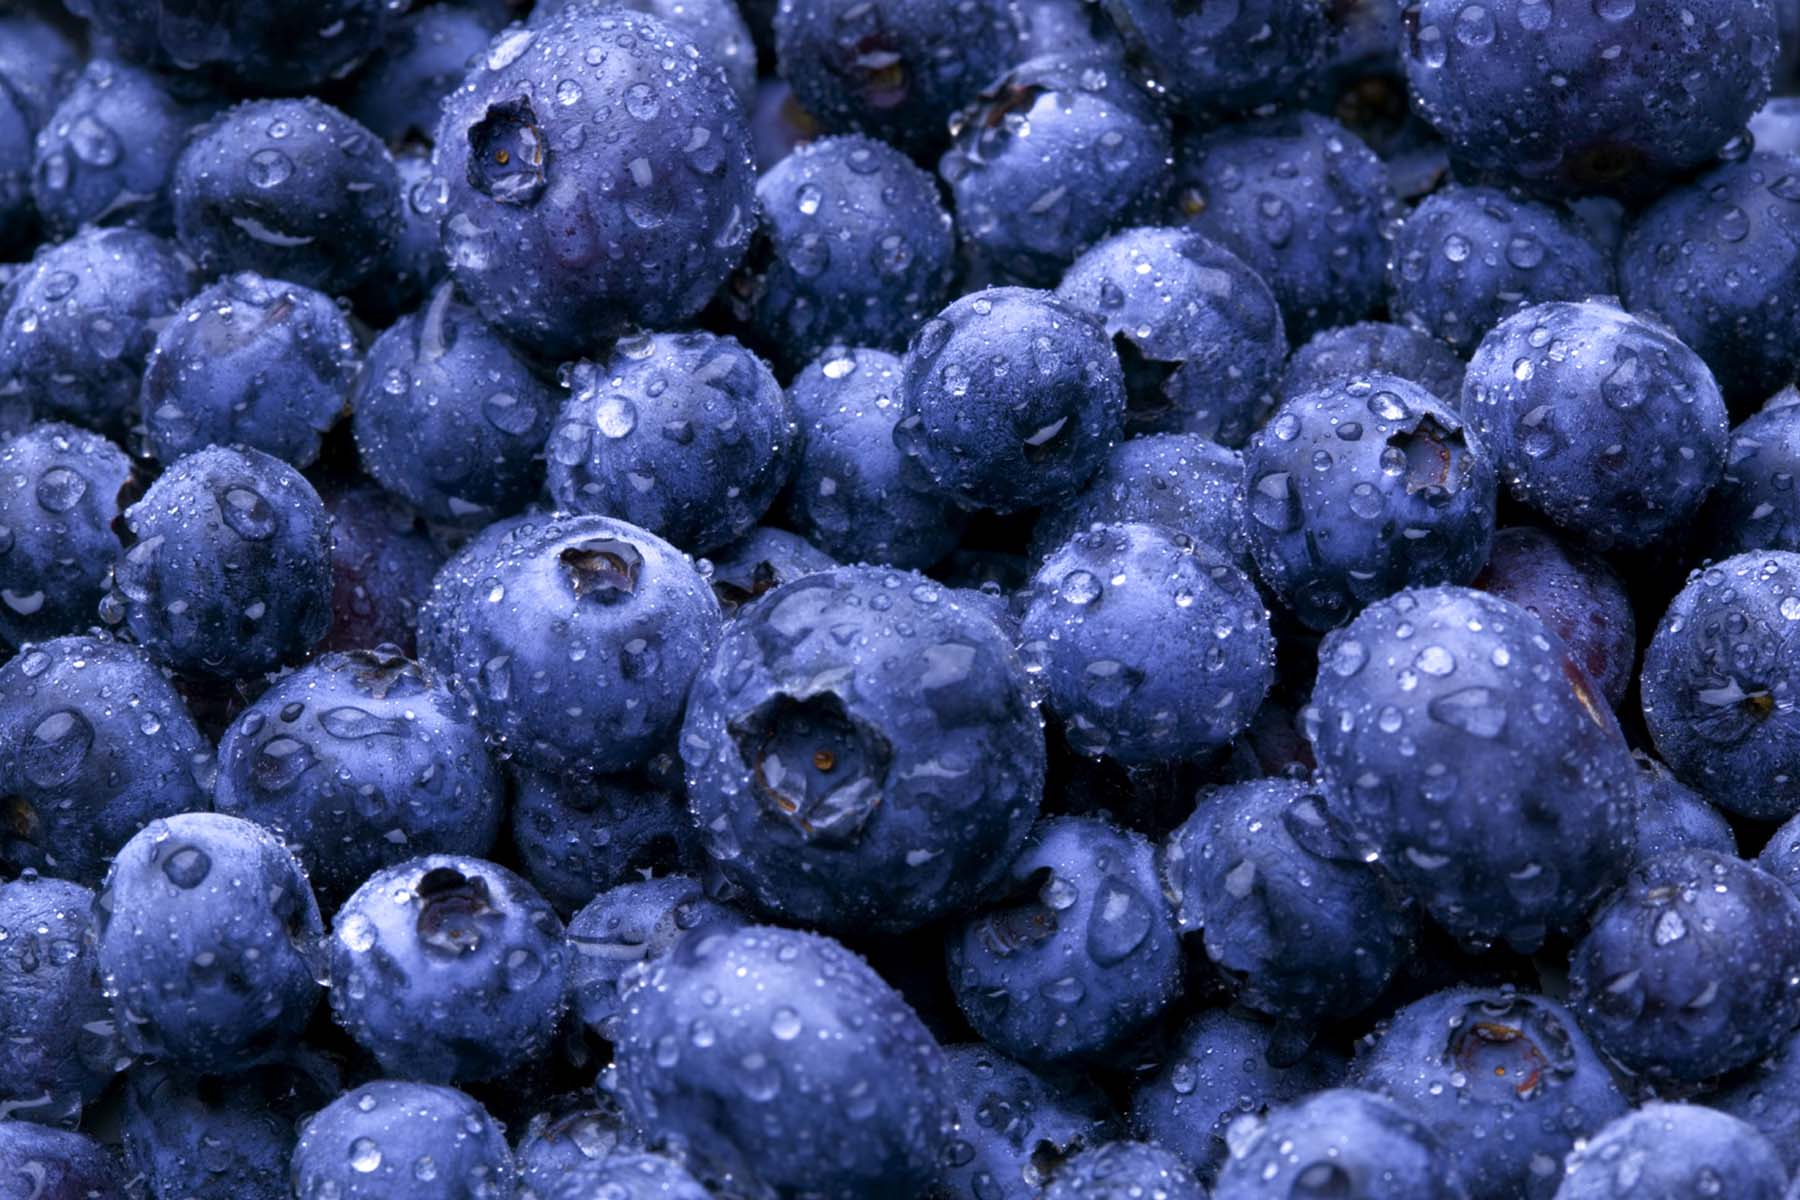 Generation Iron Blue Berries